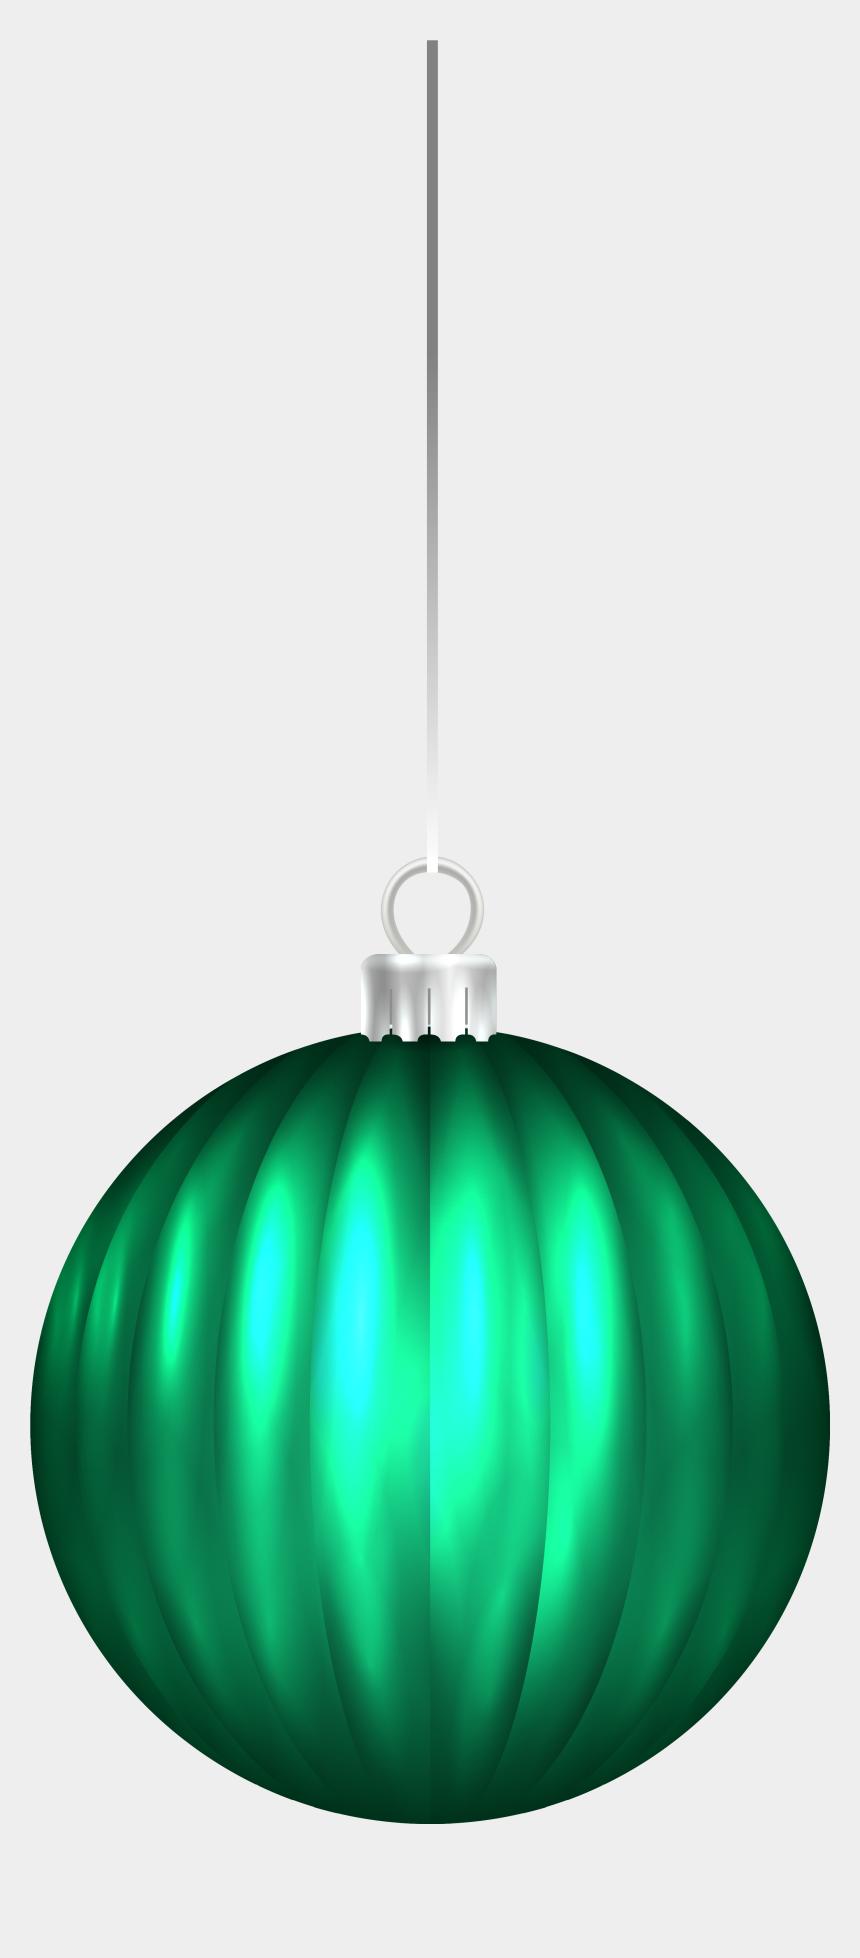 christmas decorations clipart, Cartoons - Green Christmas Ball Ornament Png Clip Art Image - Christmas Ornament